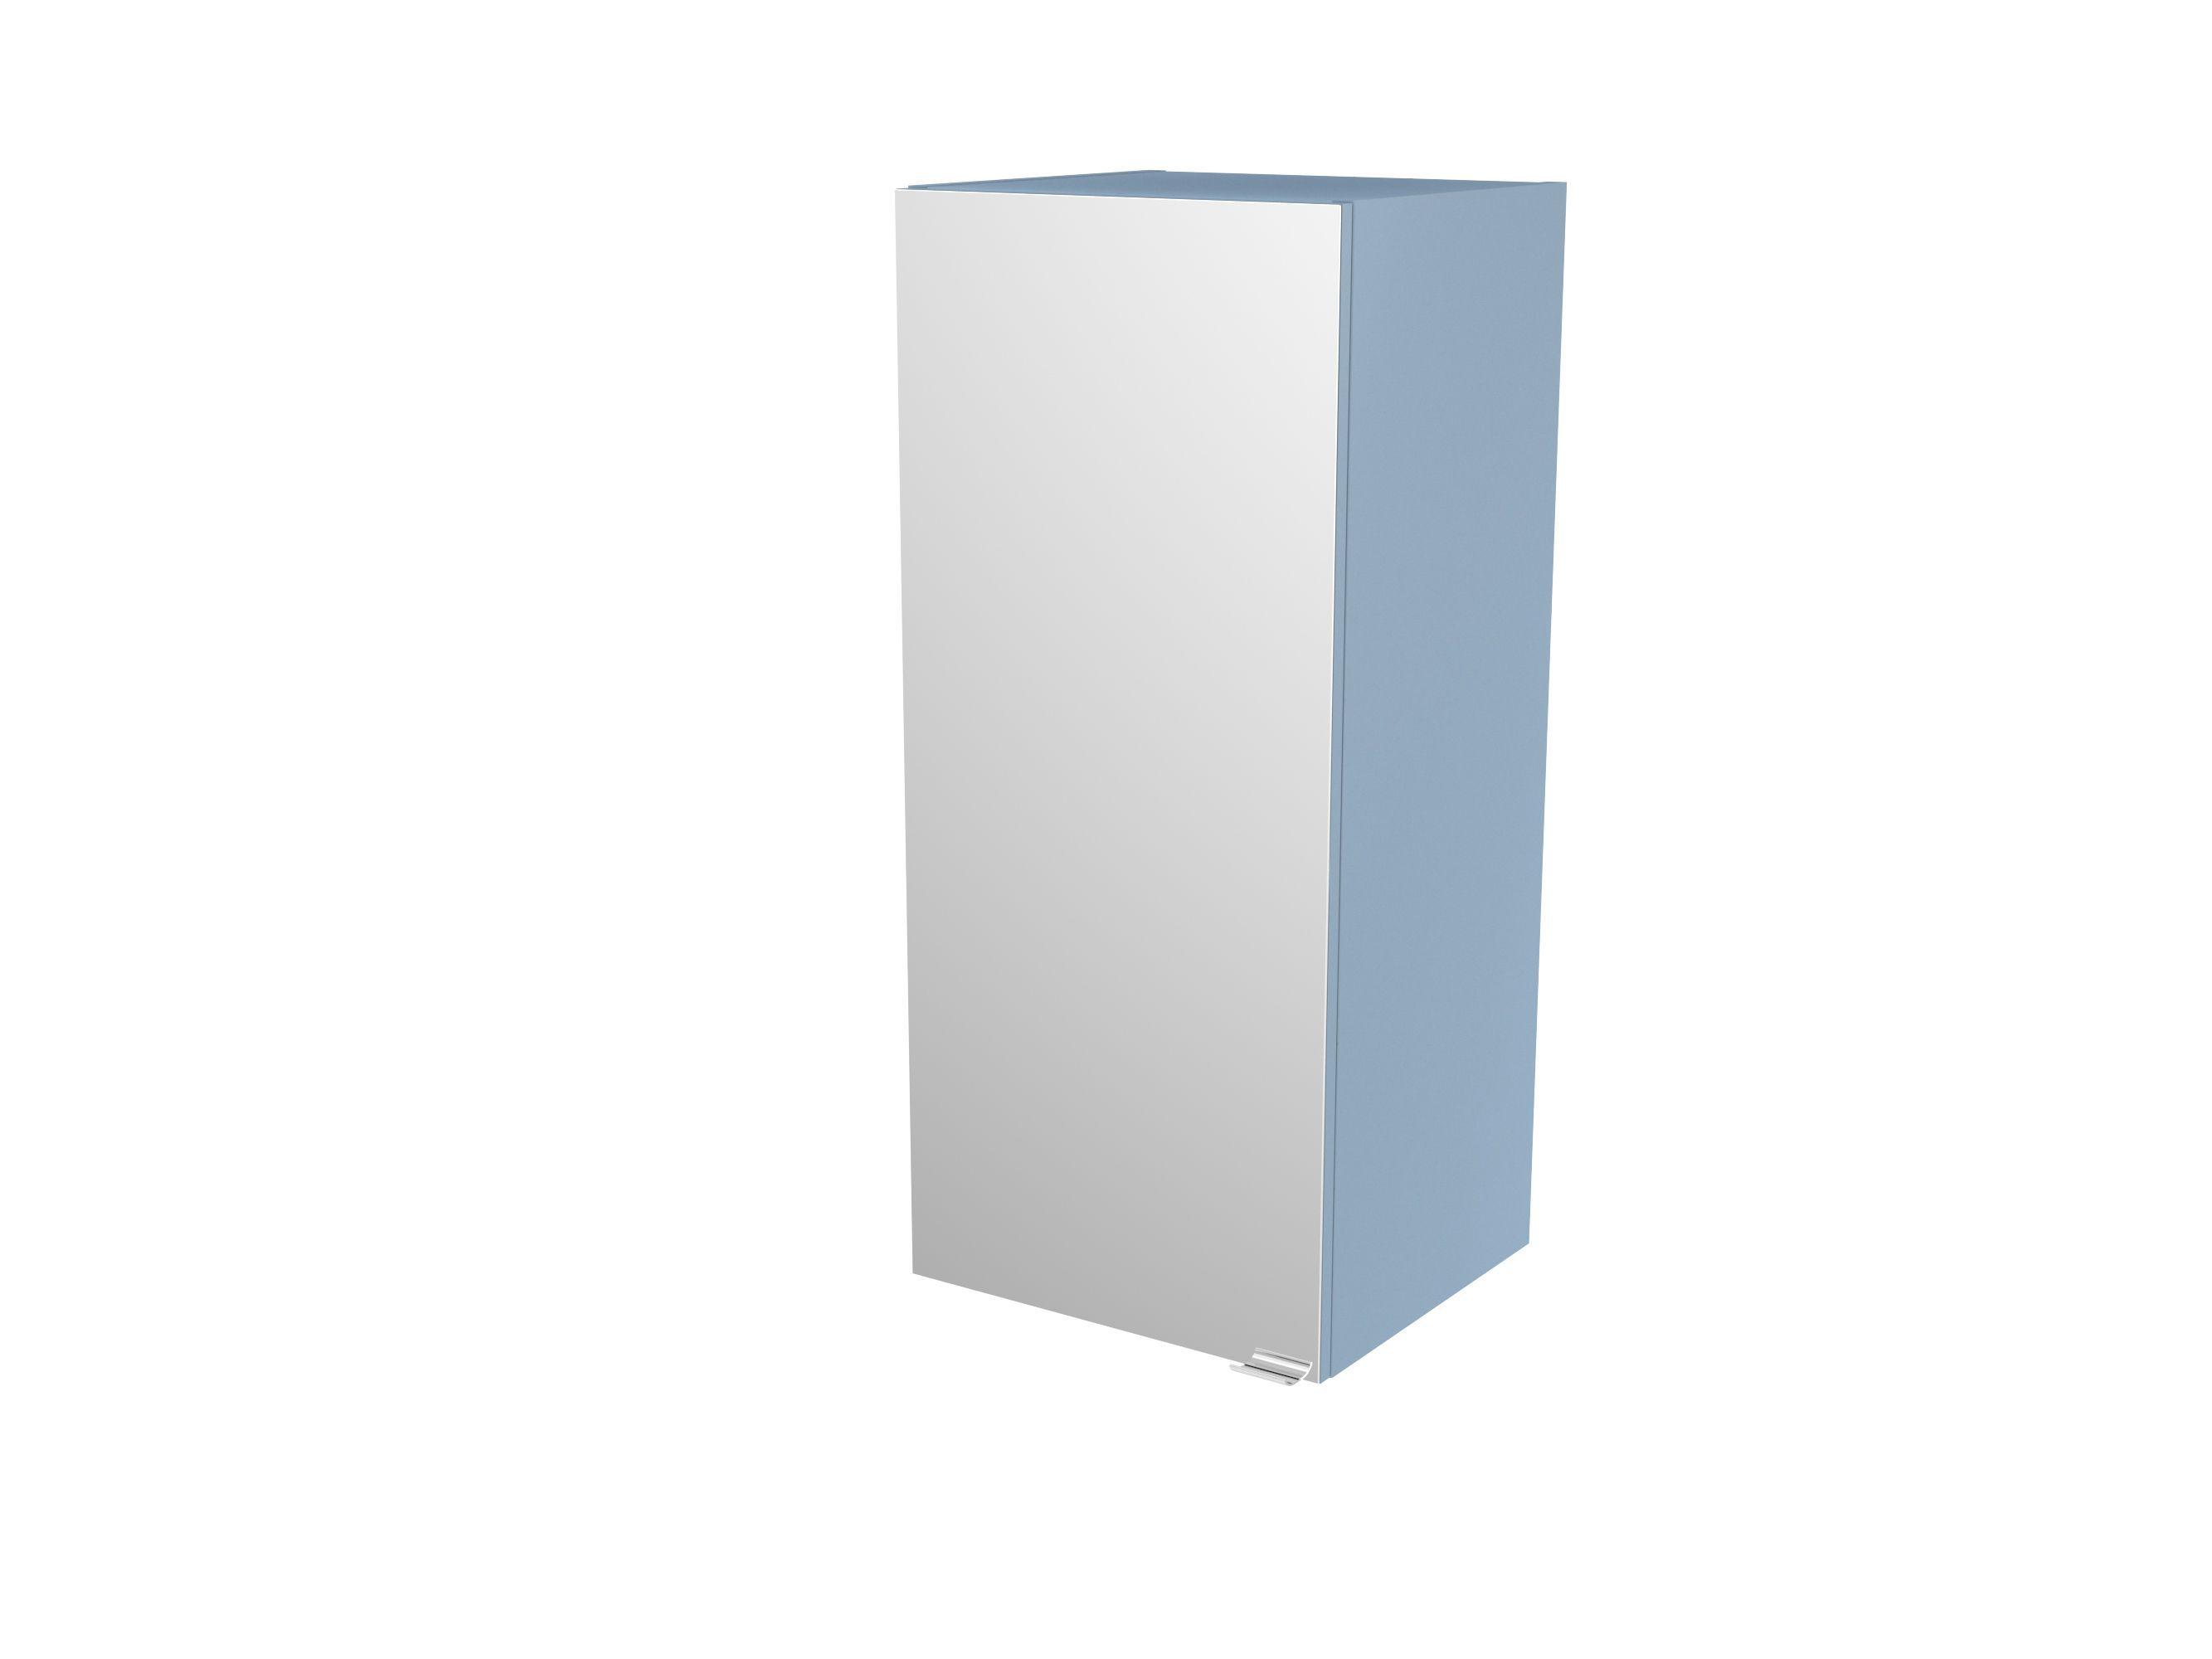 Cooke & Lewis Imandra Gloss Blue Deep Mirrored Wall Cabinet, (w)400mm